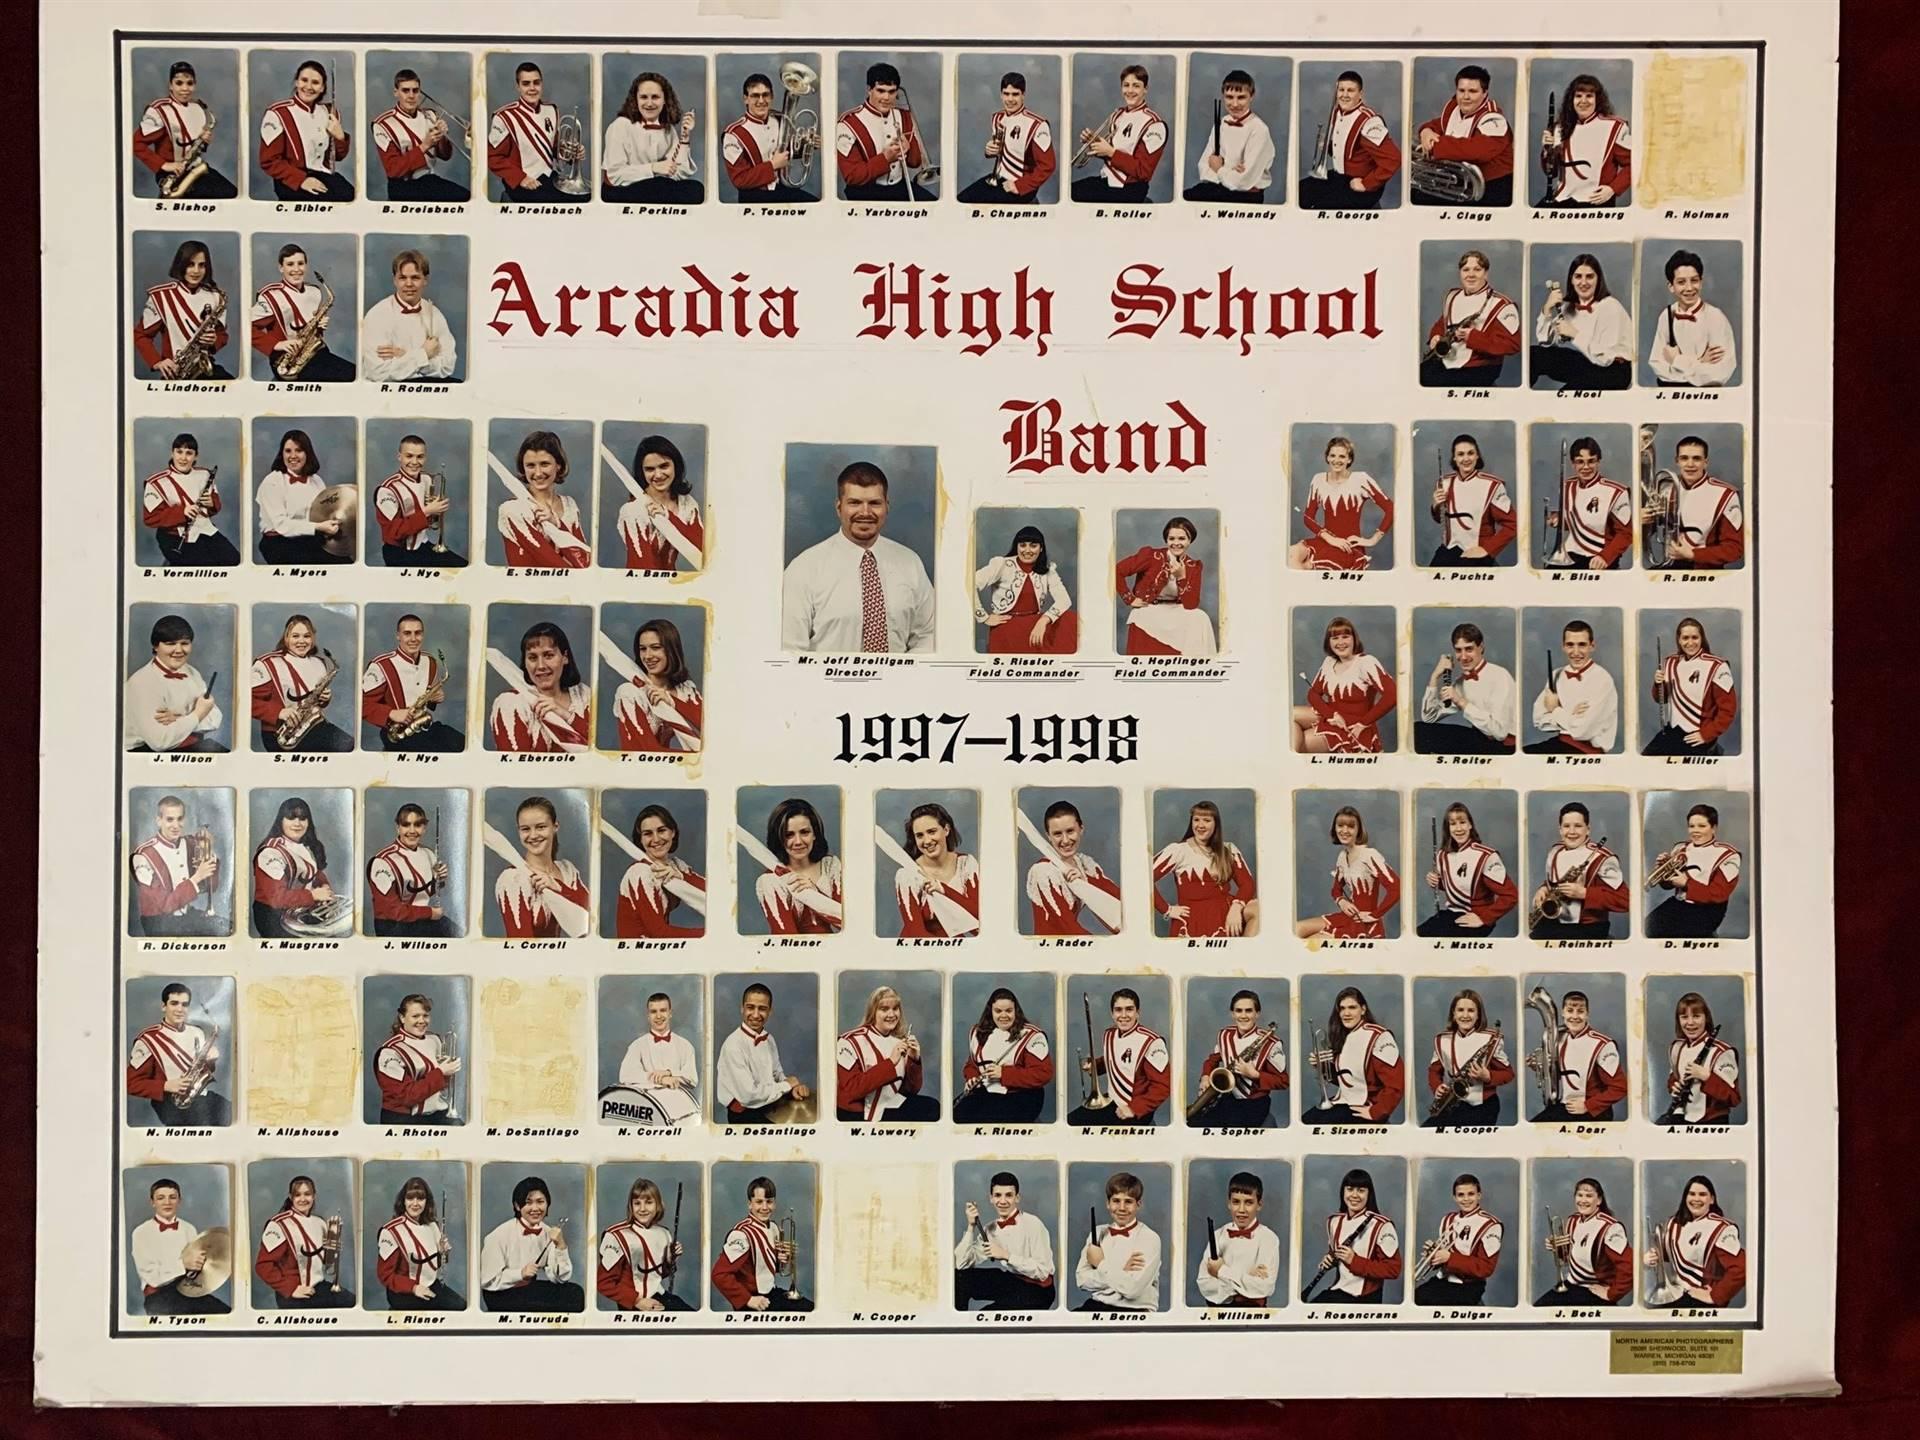 Arcadia High School Band 1997-1998